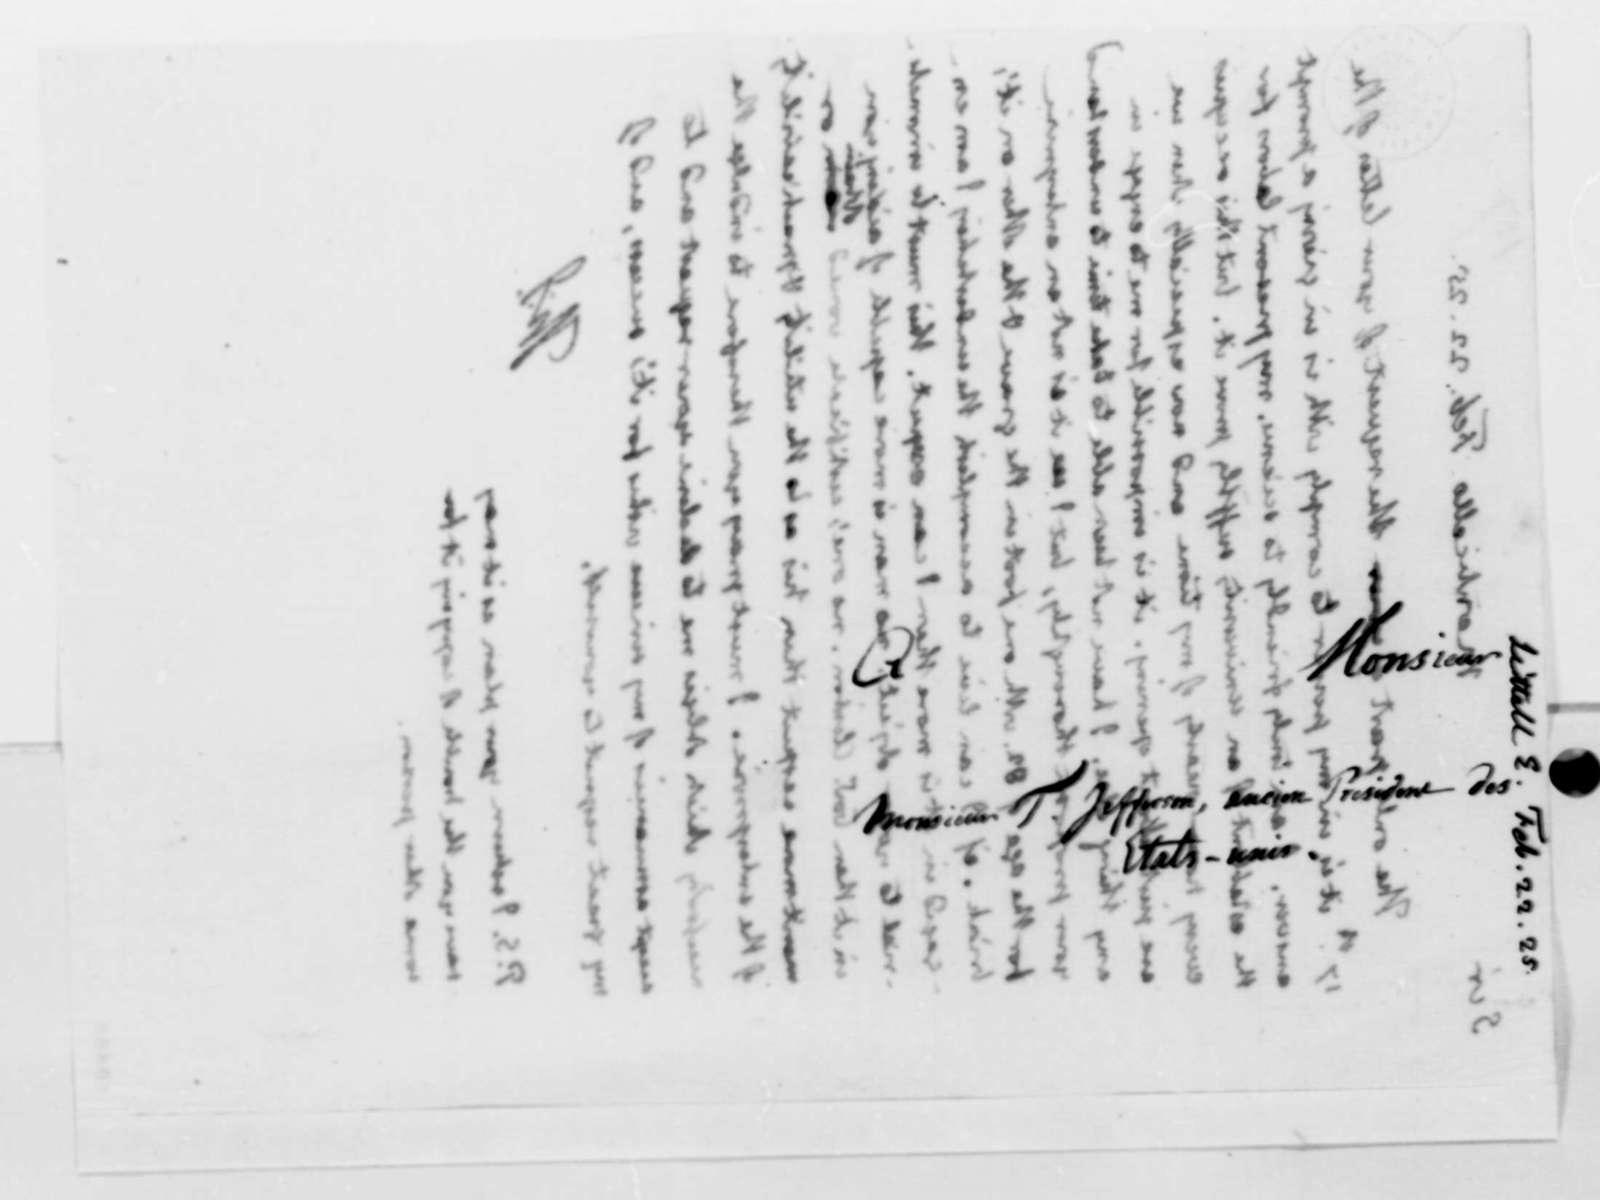 Thomas Jefferson to E. Littell, February 22, 1825